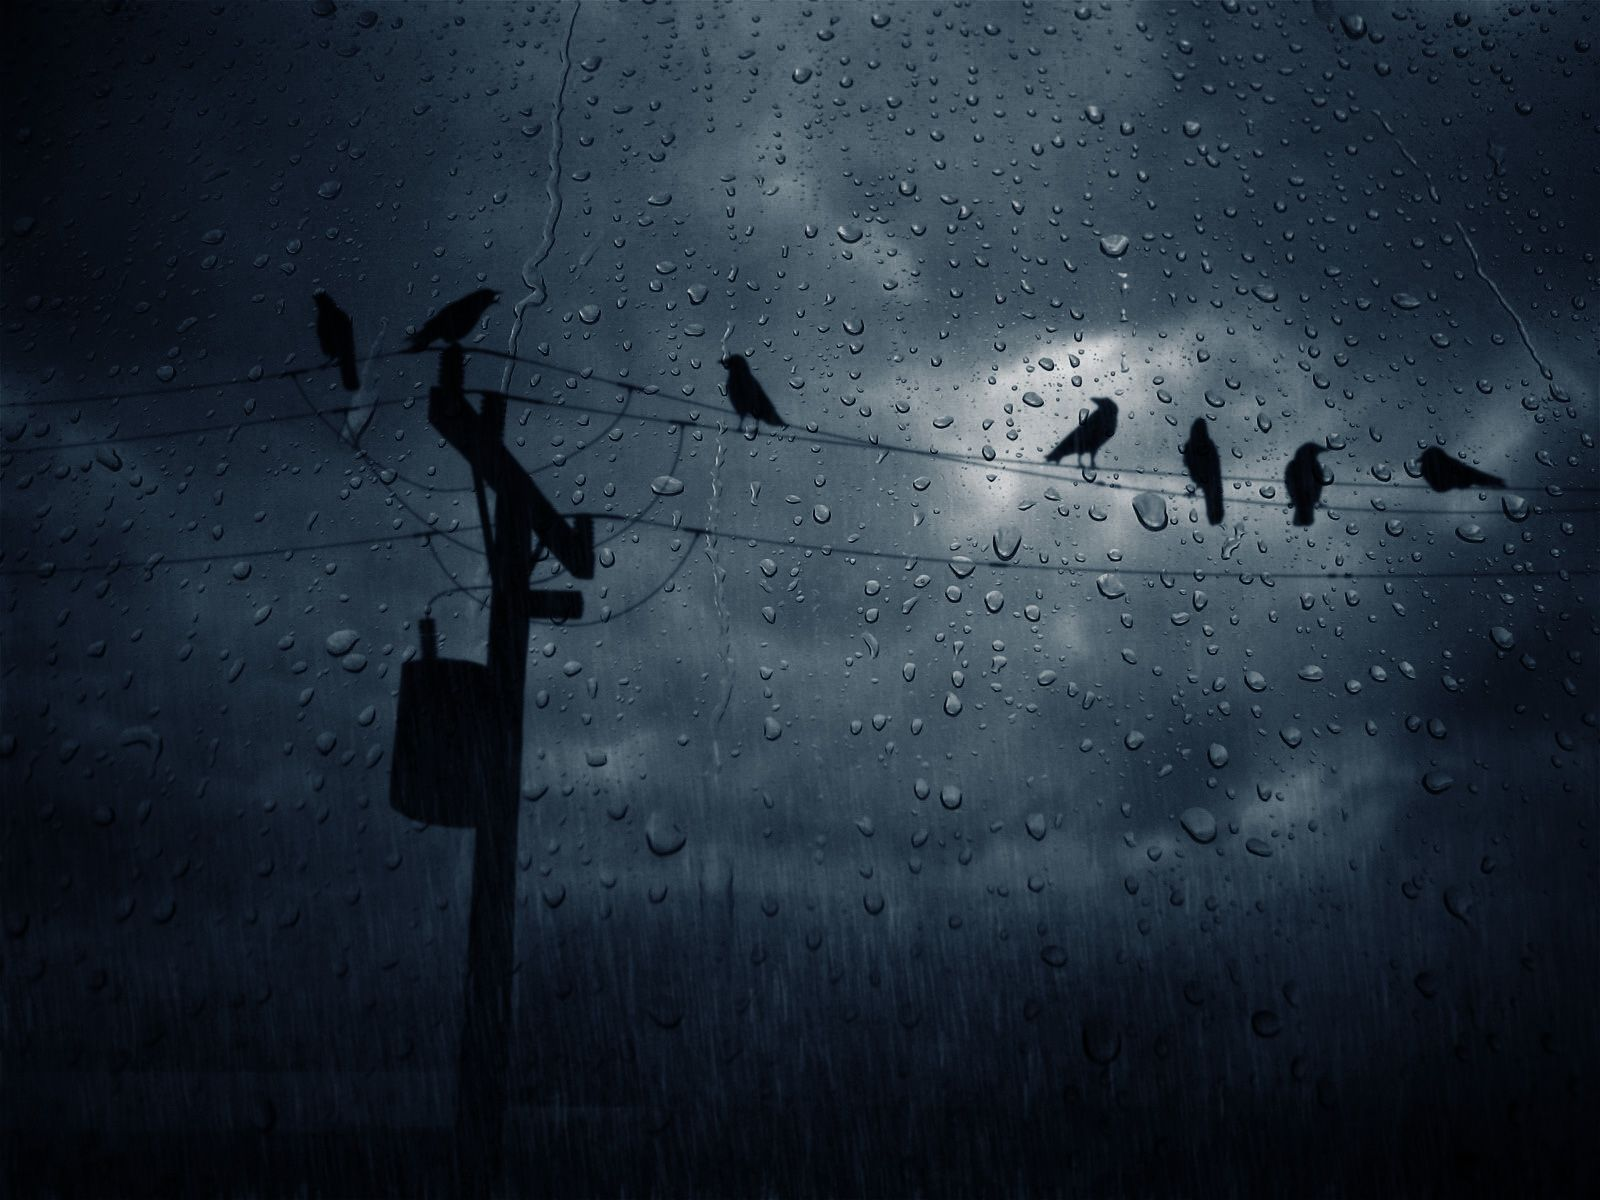 awesome rain birds power lines ravens  - Wallpaper